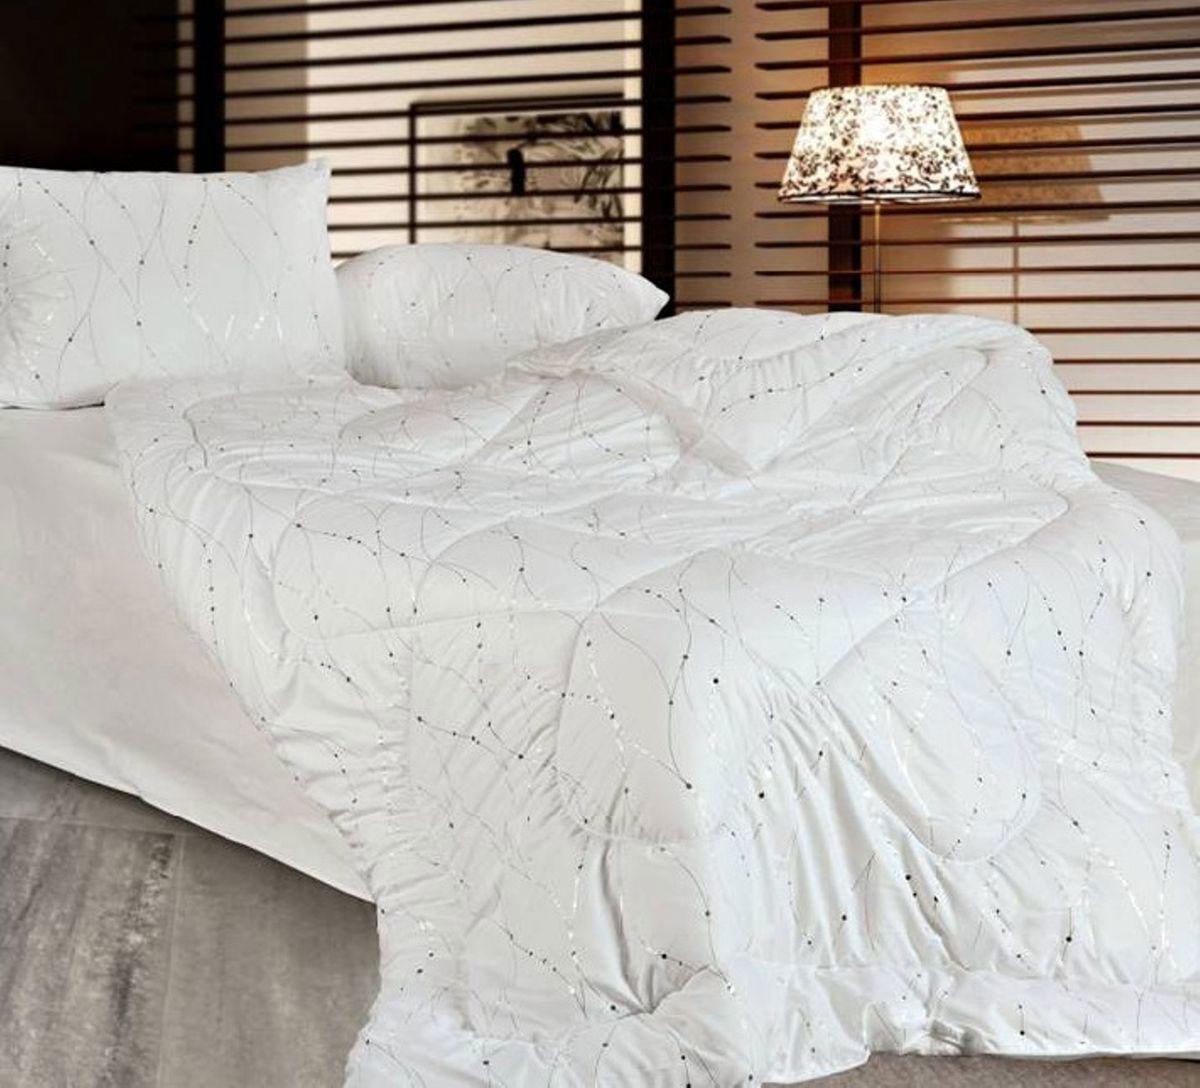 Подушка Home & Style, цвет: белый, 50 х 70 см подушки 1st home подушка 50 70 лён